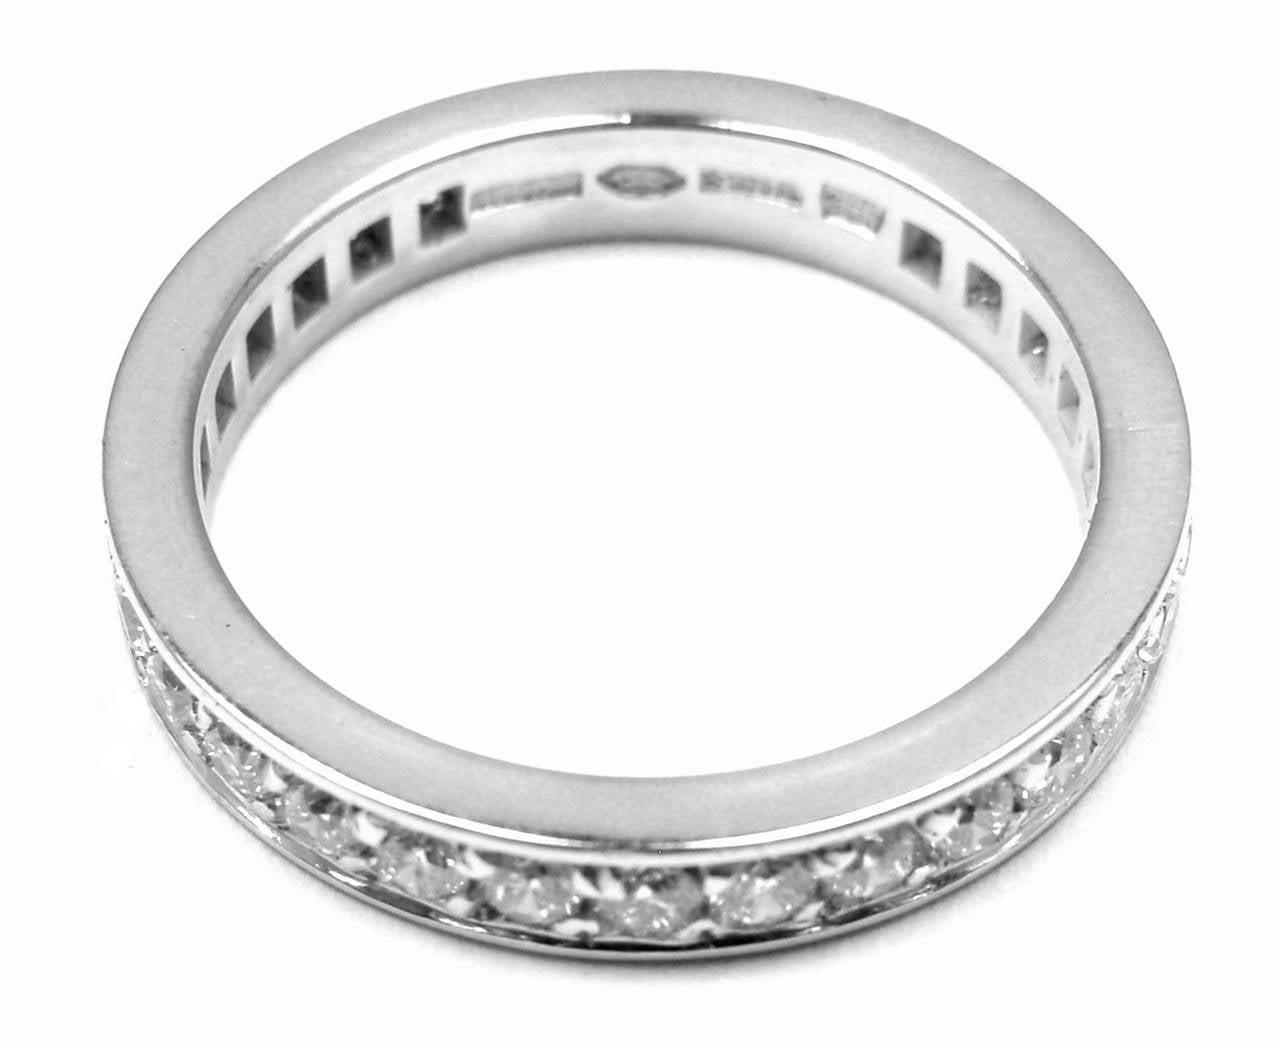 bulgari platinum eternity wedding band ring at 1stdibs